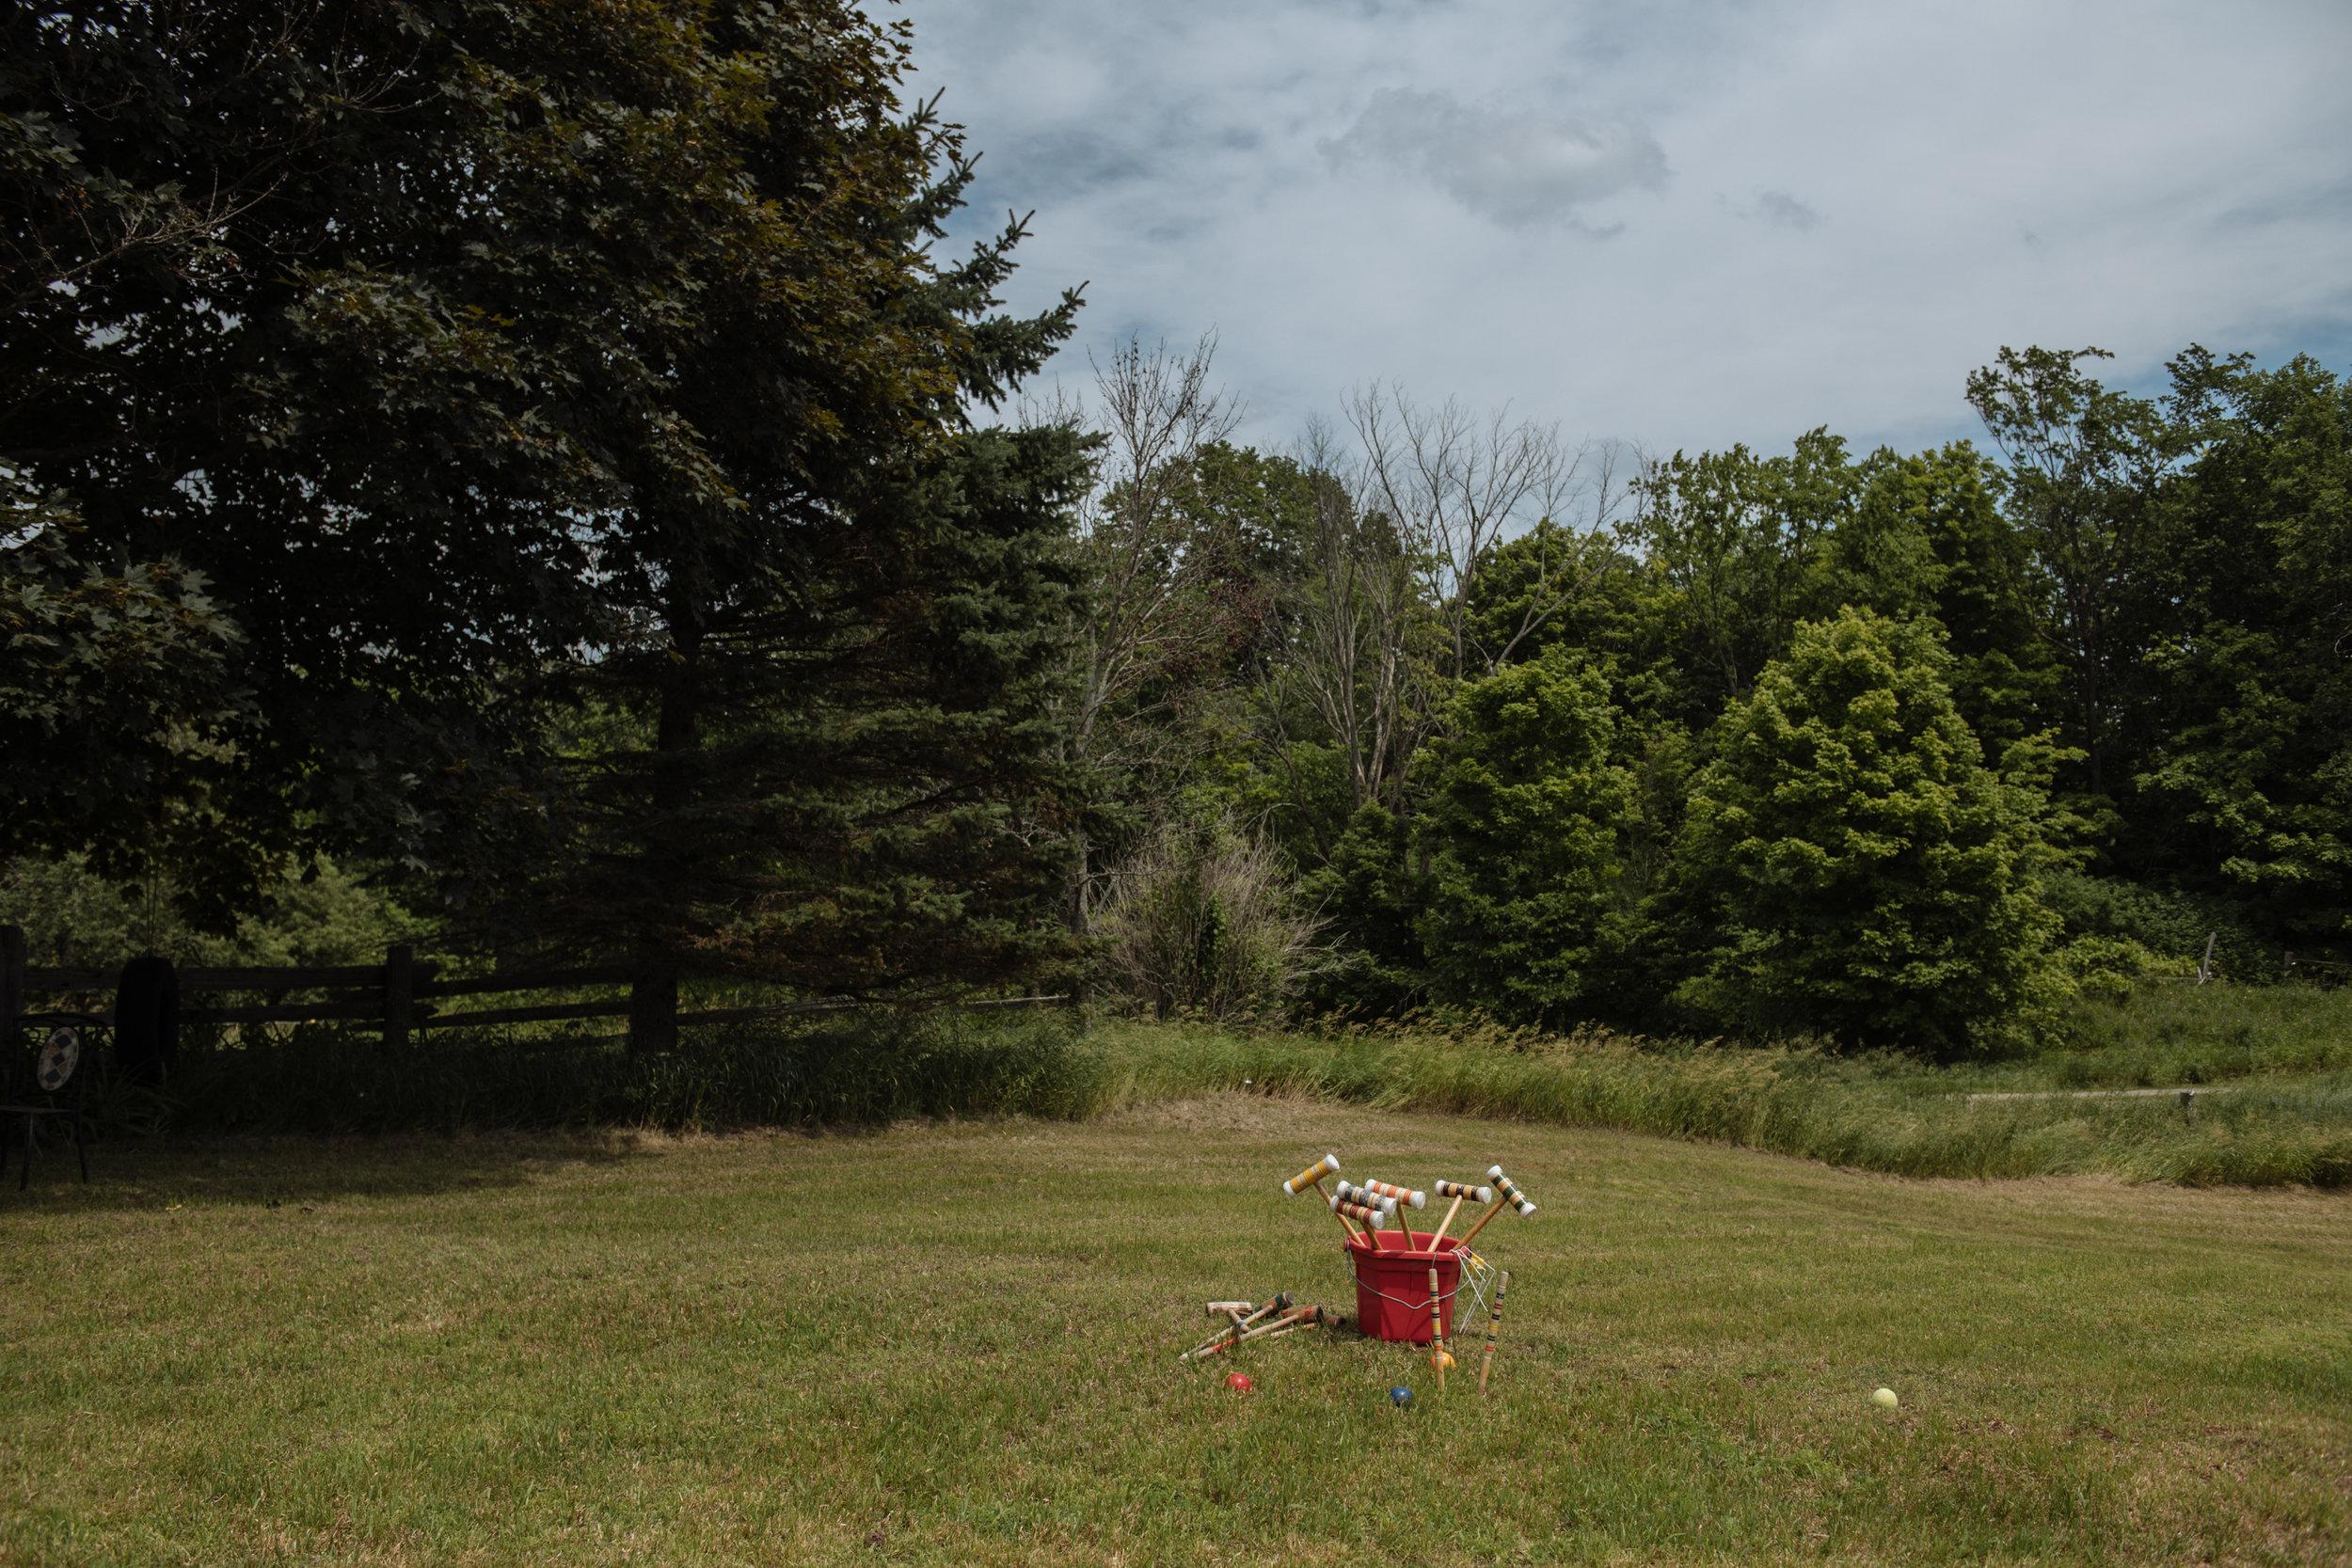 Rodan-Farmhouse-070719-178.jpg